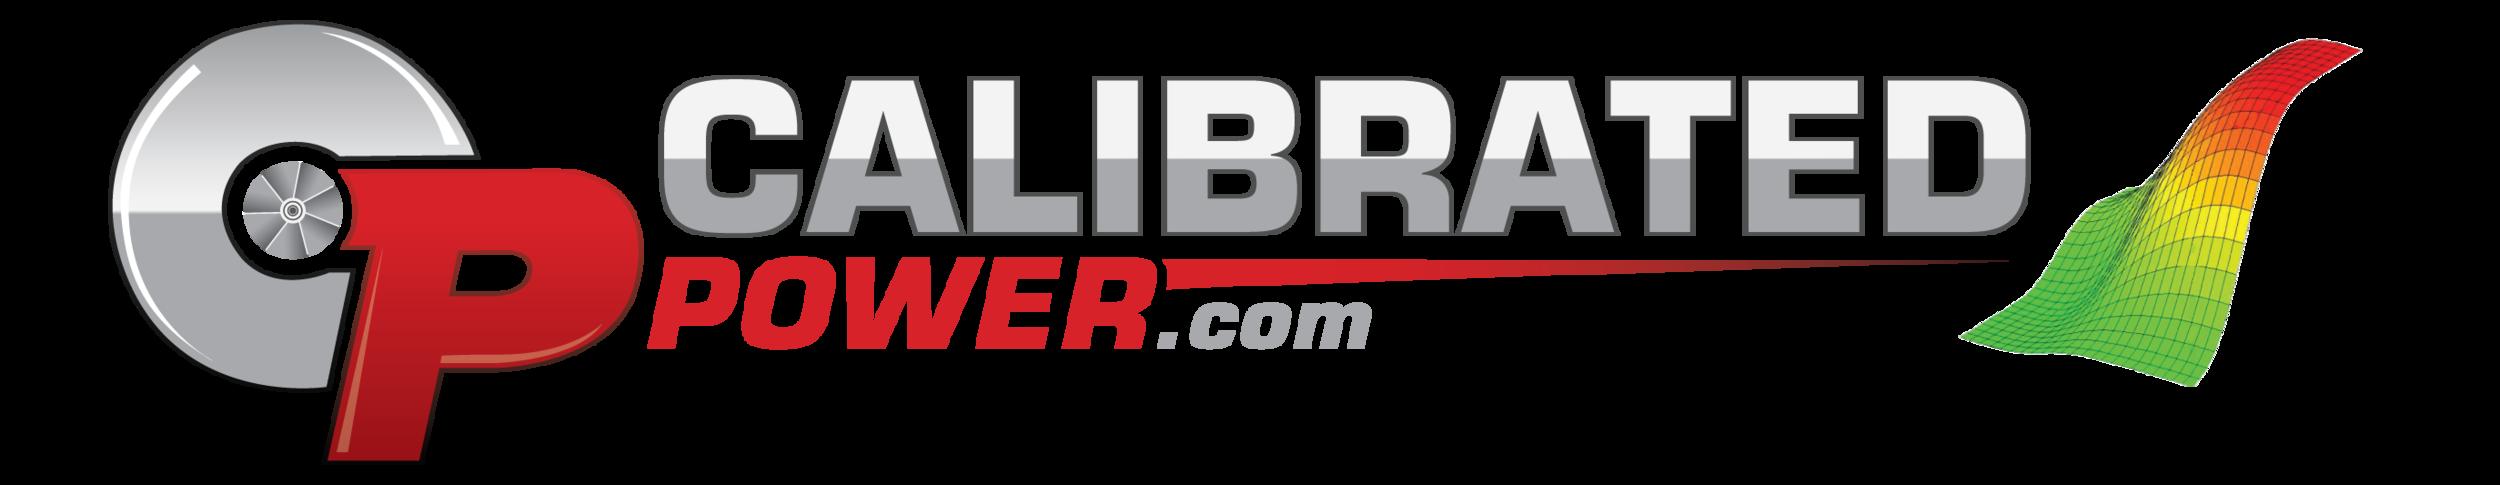 CalibratedPower_Logo_LigtherVersion_072214 copy.png